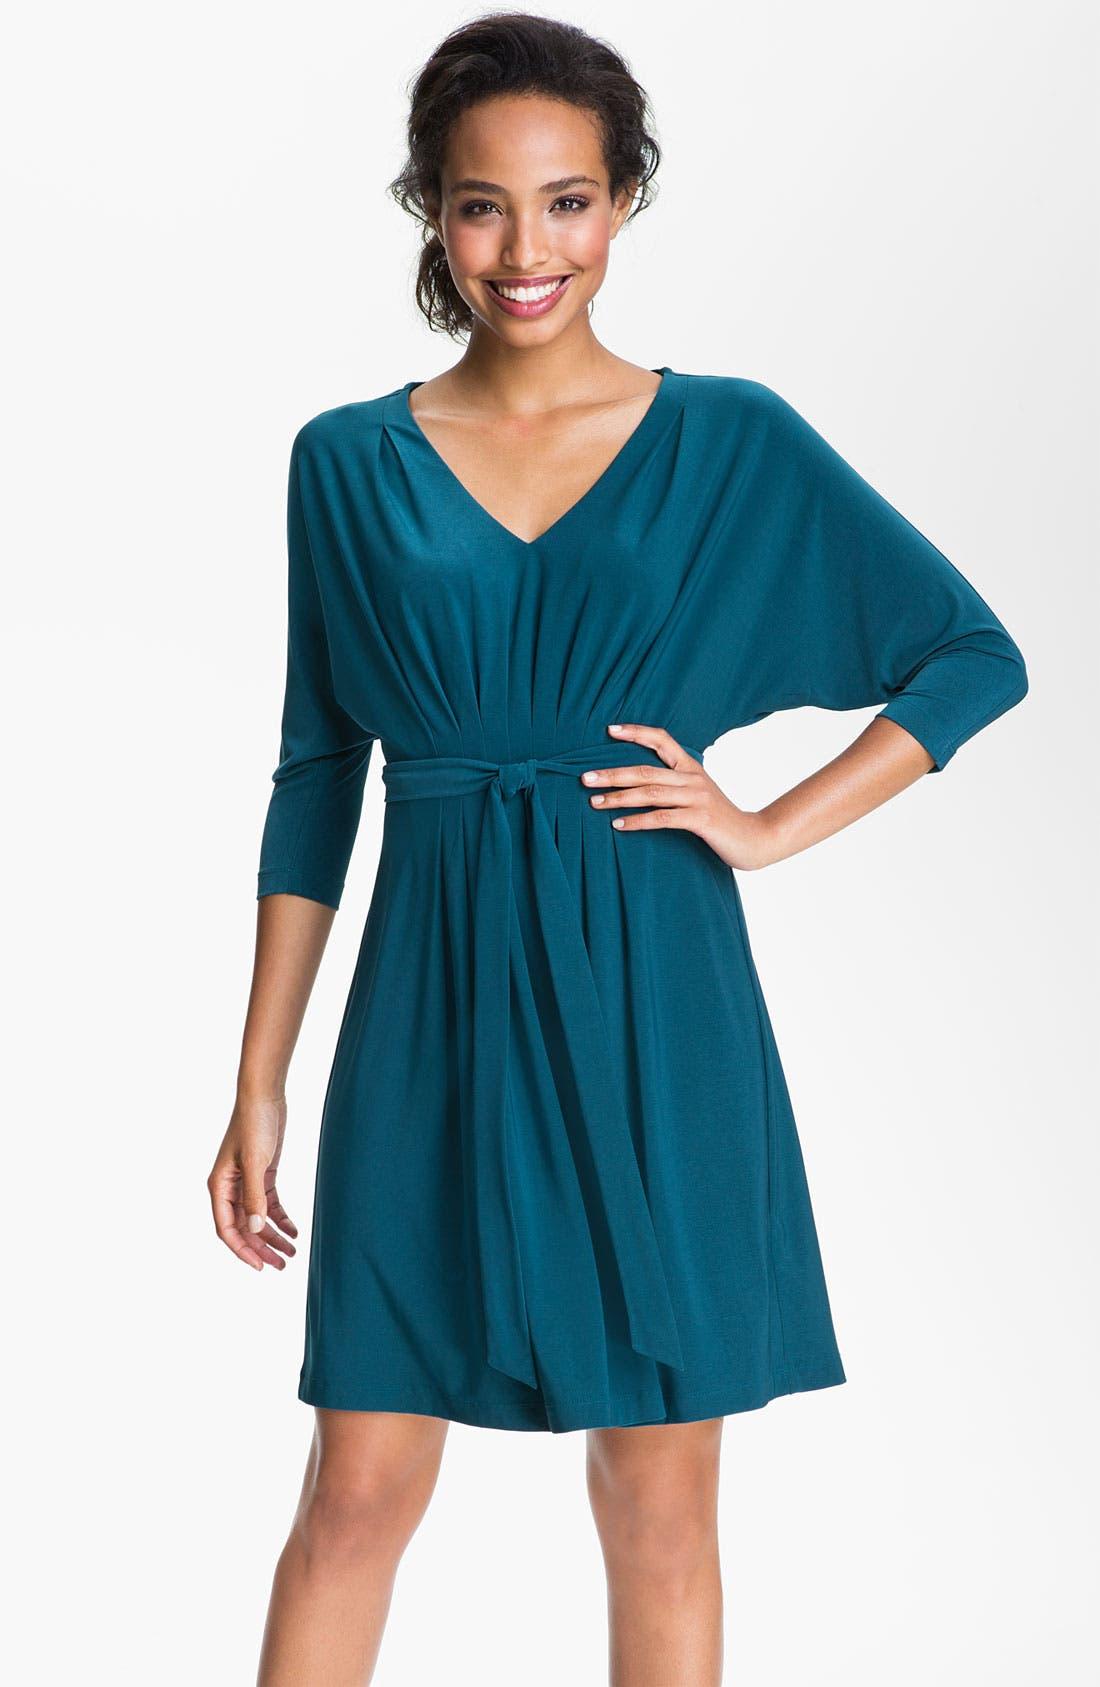 Alternate Image 1 Selected - Alex & Ava Dolman Sleeve Jersey Dress